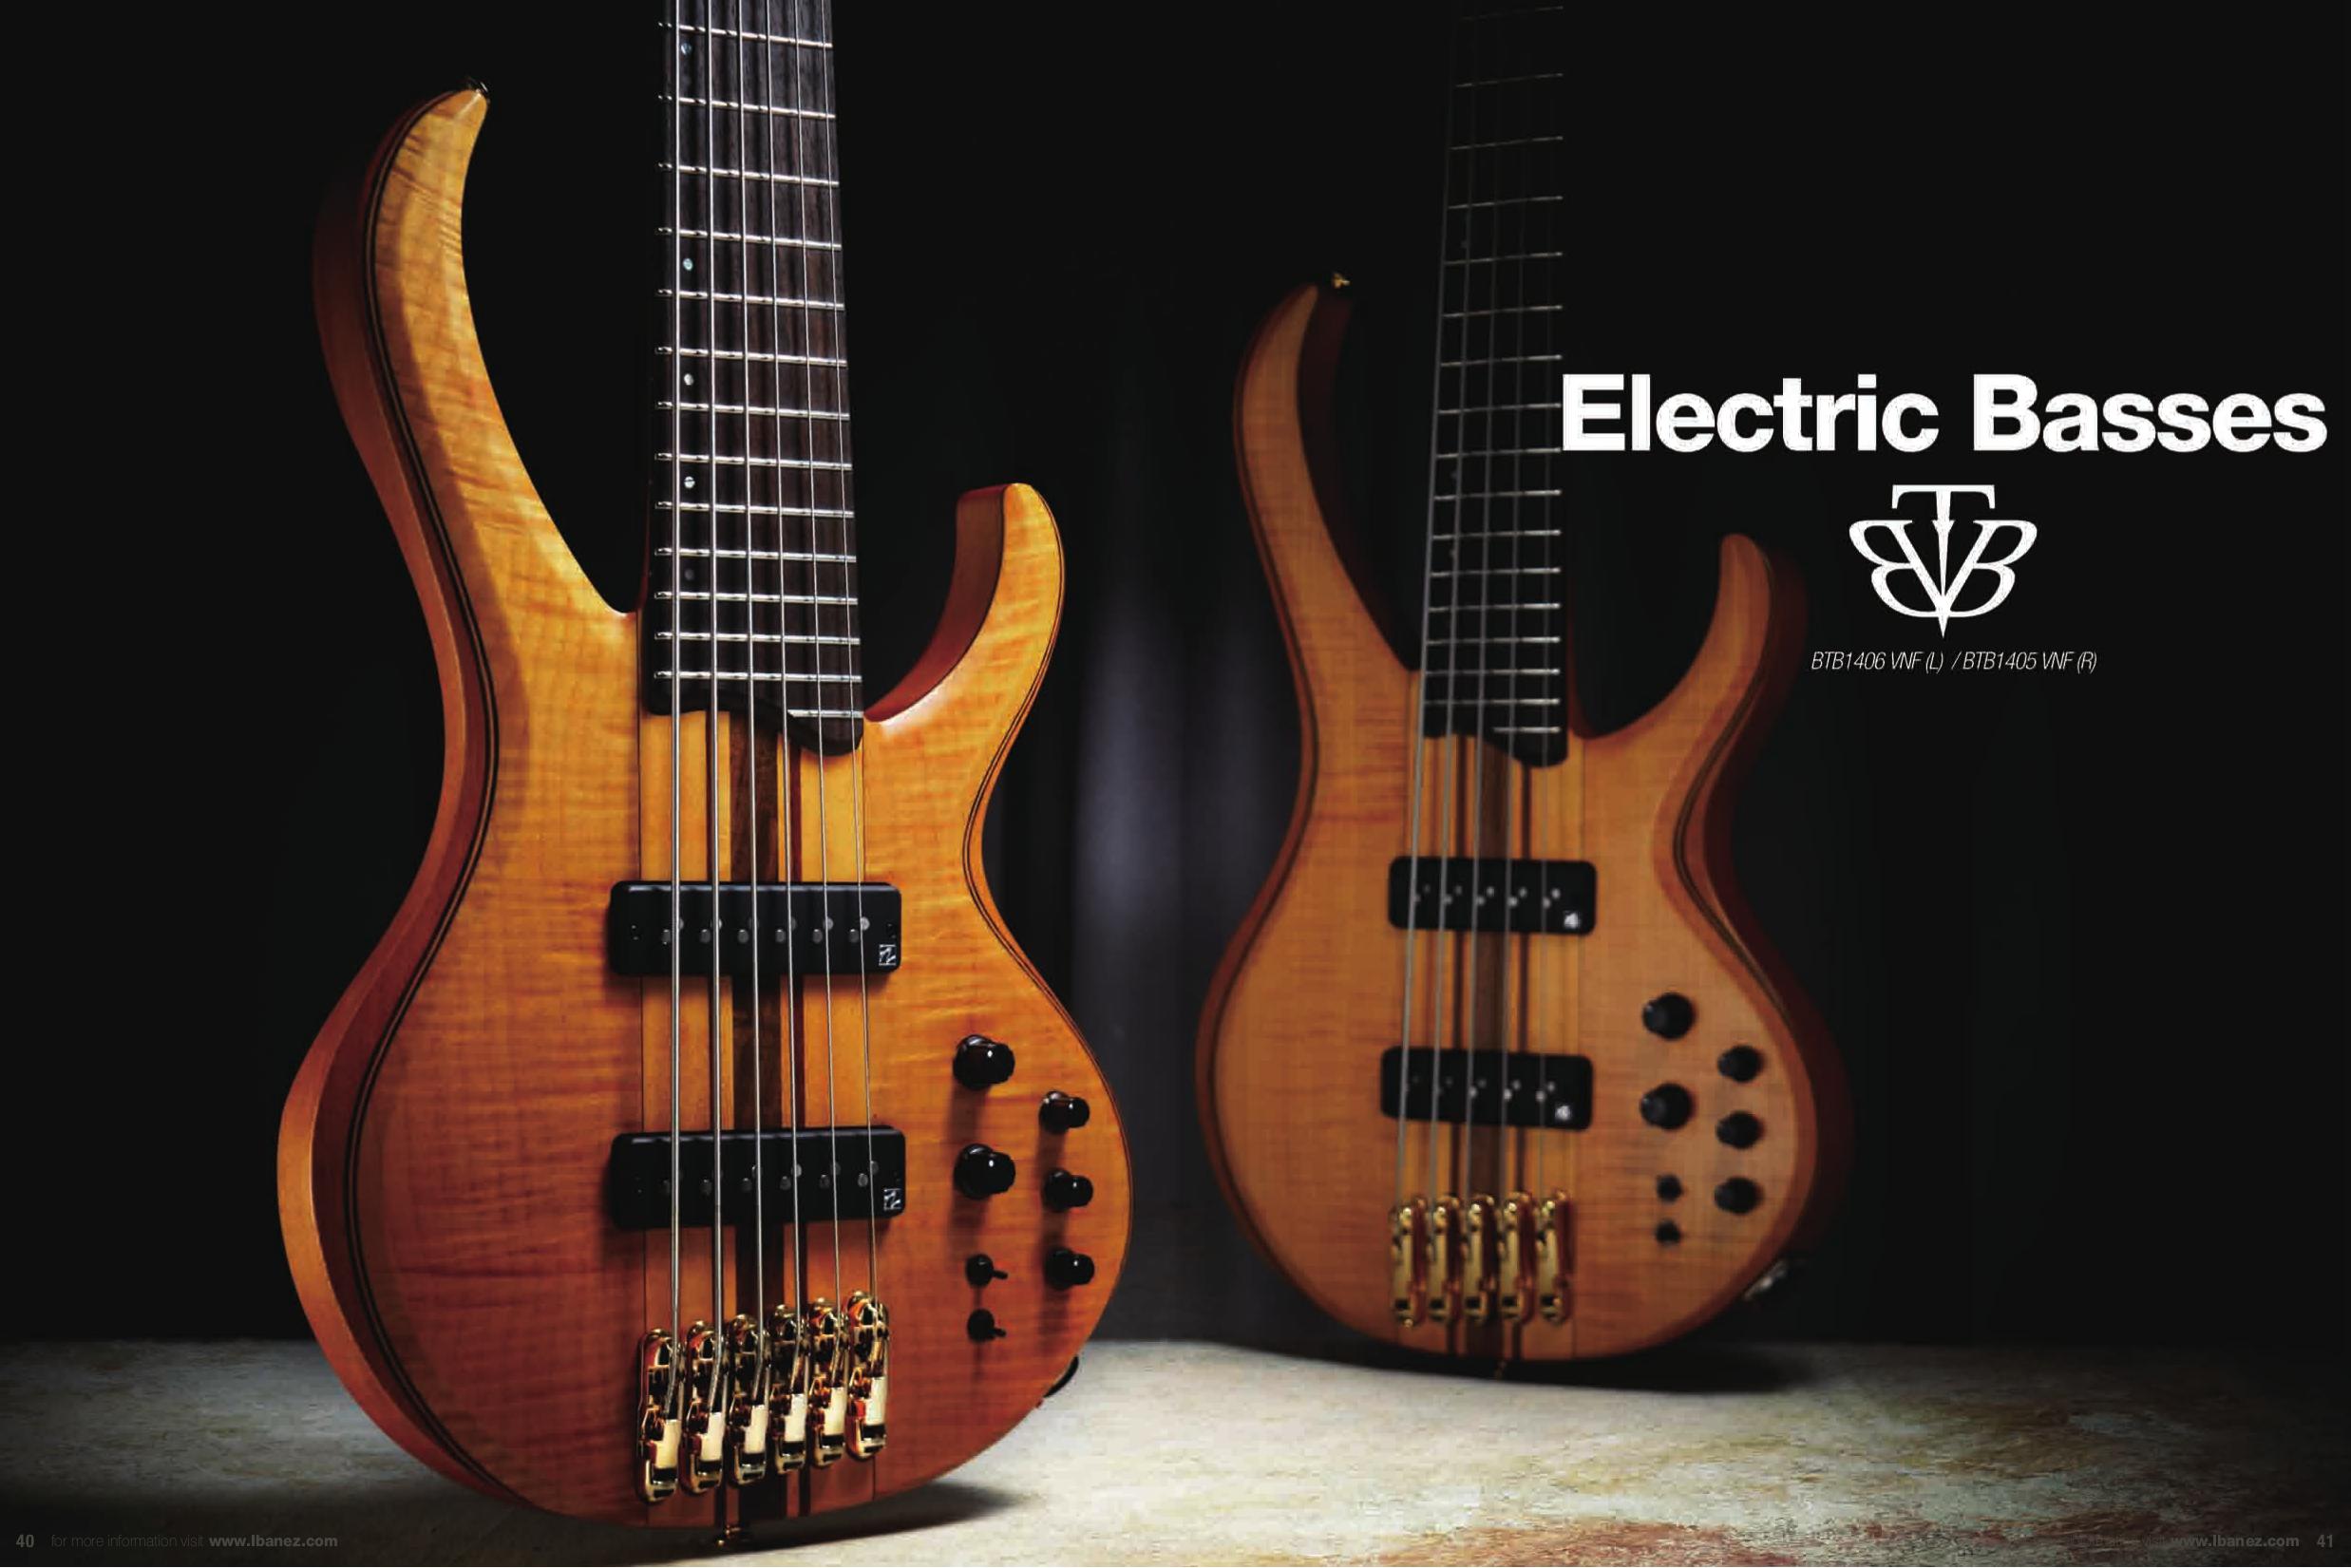 Download free pdf for Ibanez SR Series SR506 Guitar manual on